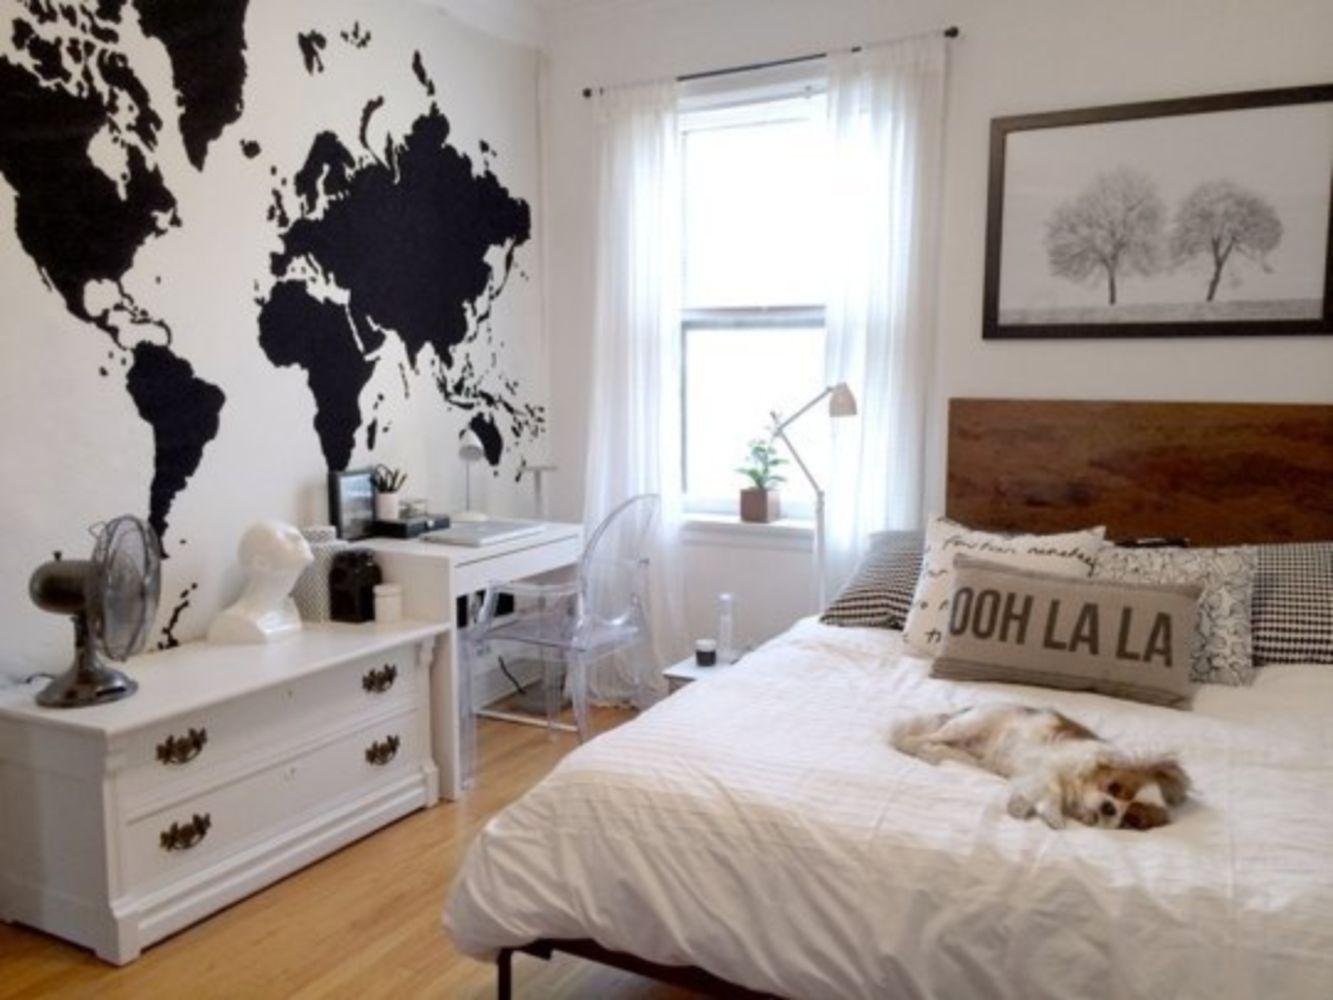 37 Minimalist Small Bedroom With Monochromatic 37